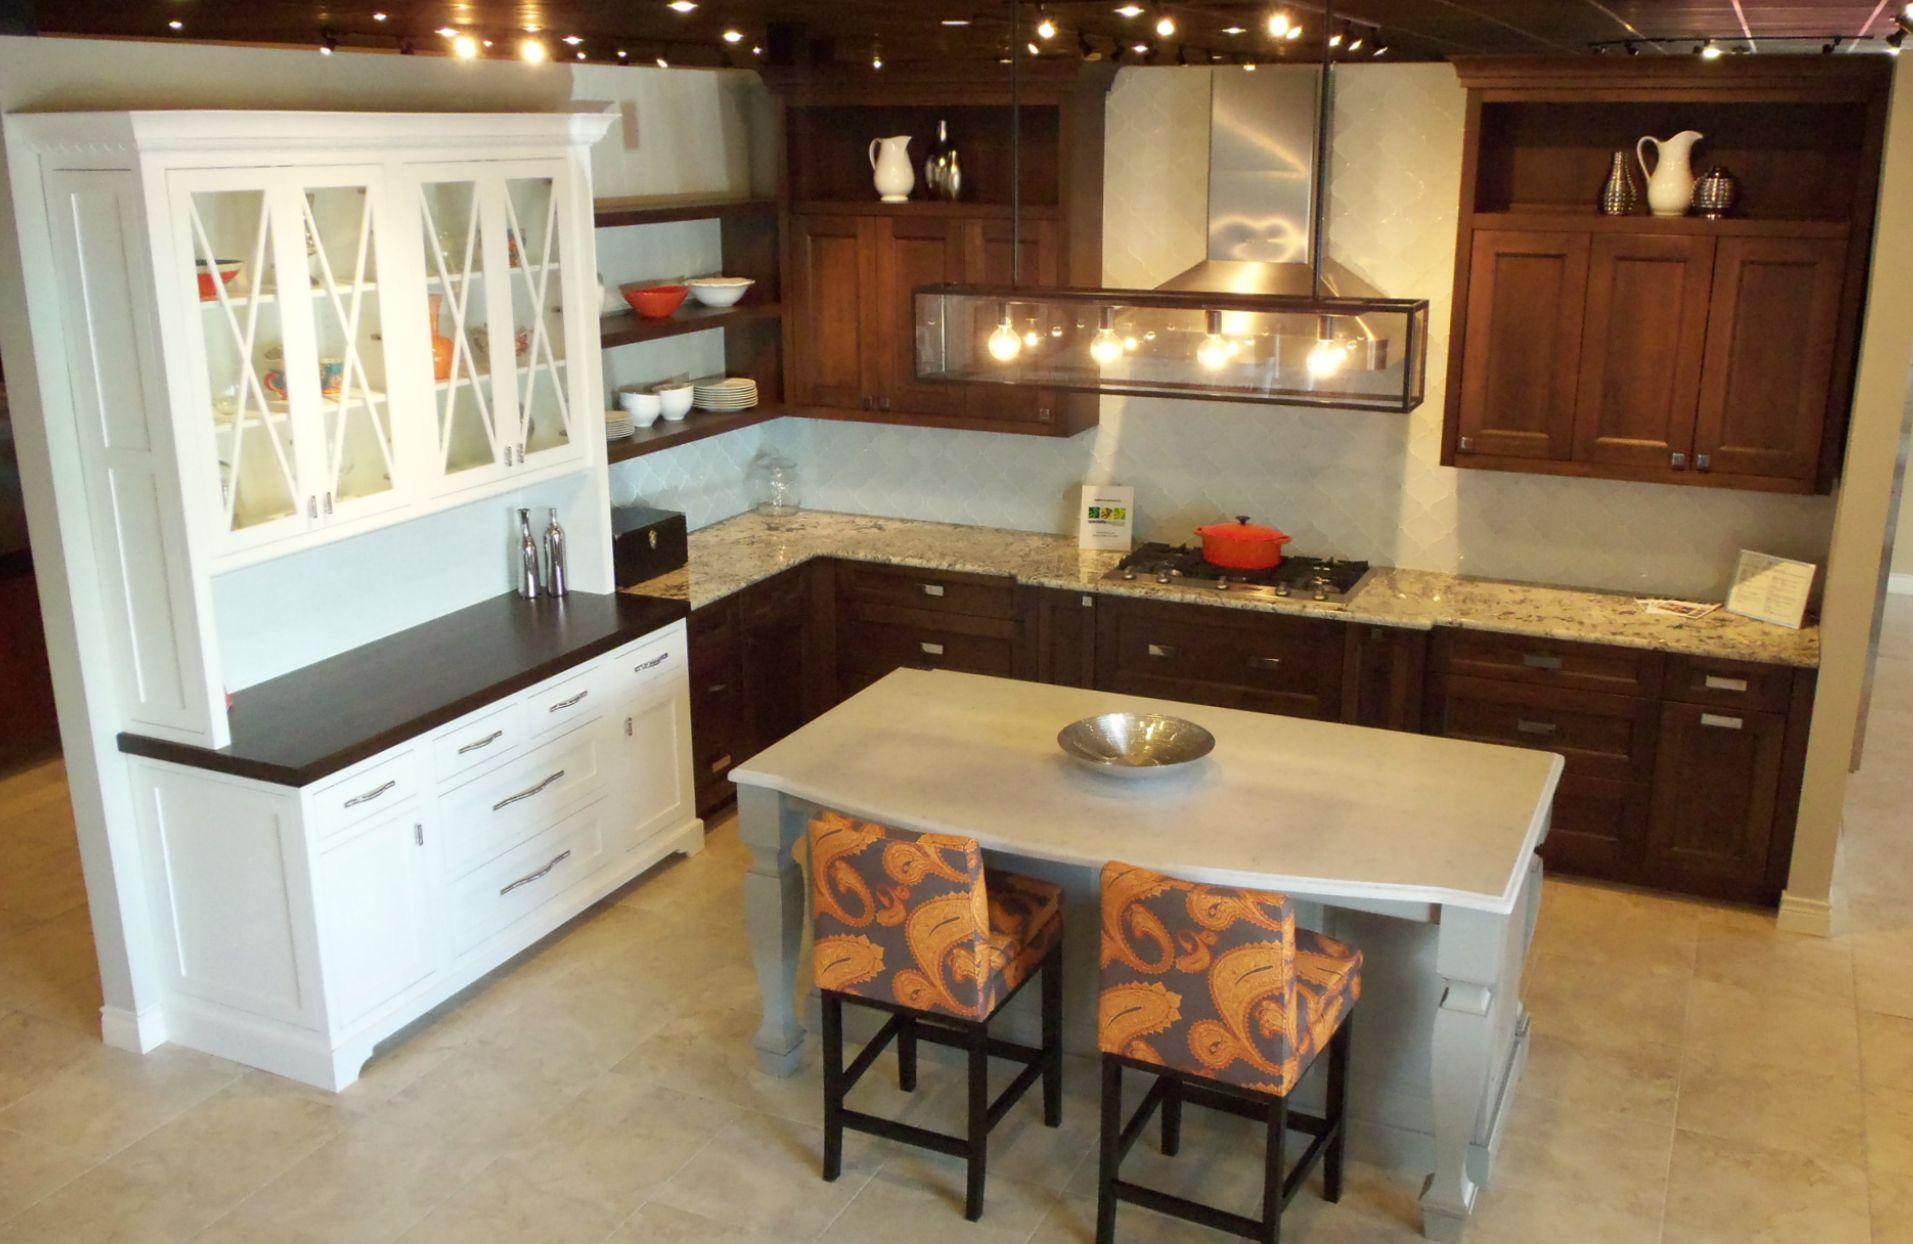 Ace kitchen direct cabinets - Bkc Showroom Update Bkc Kitchen And Bath